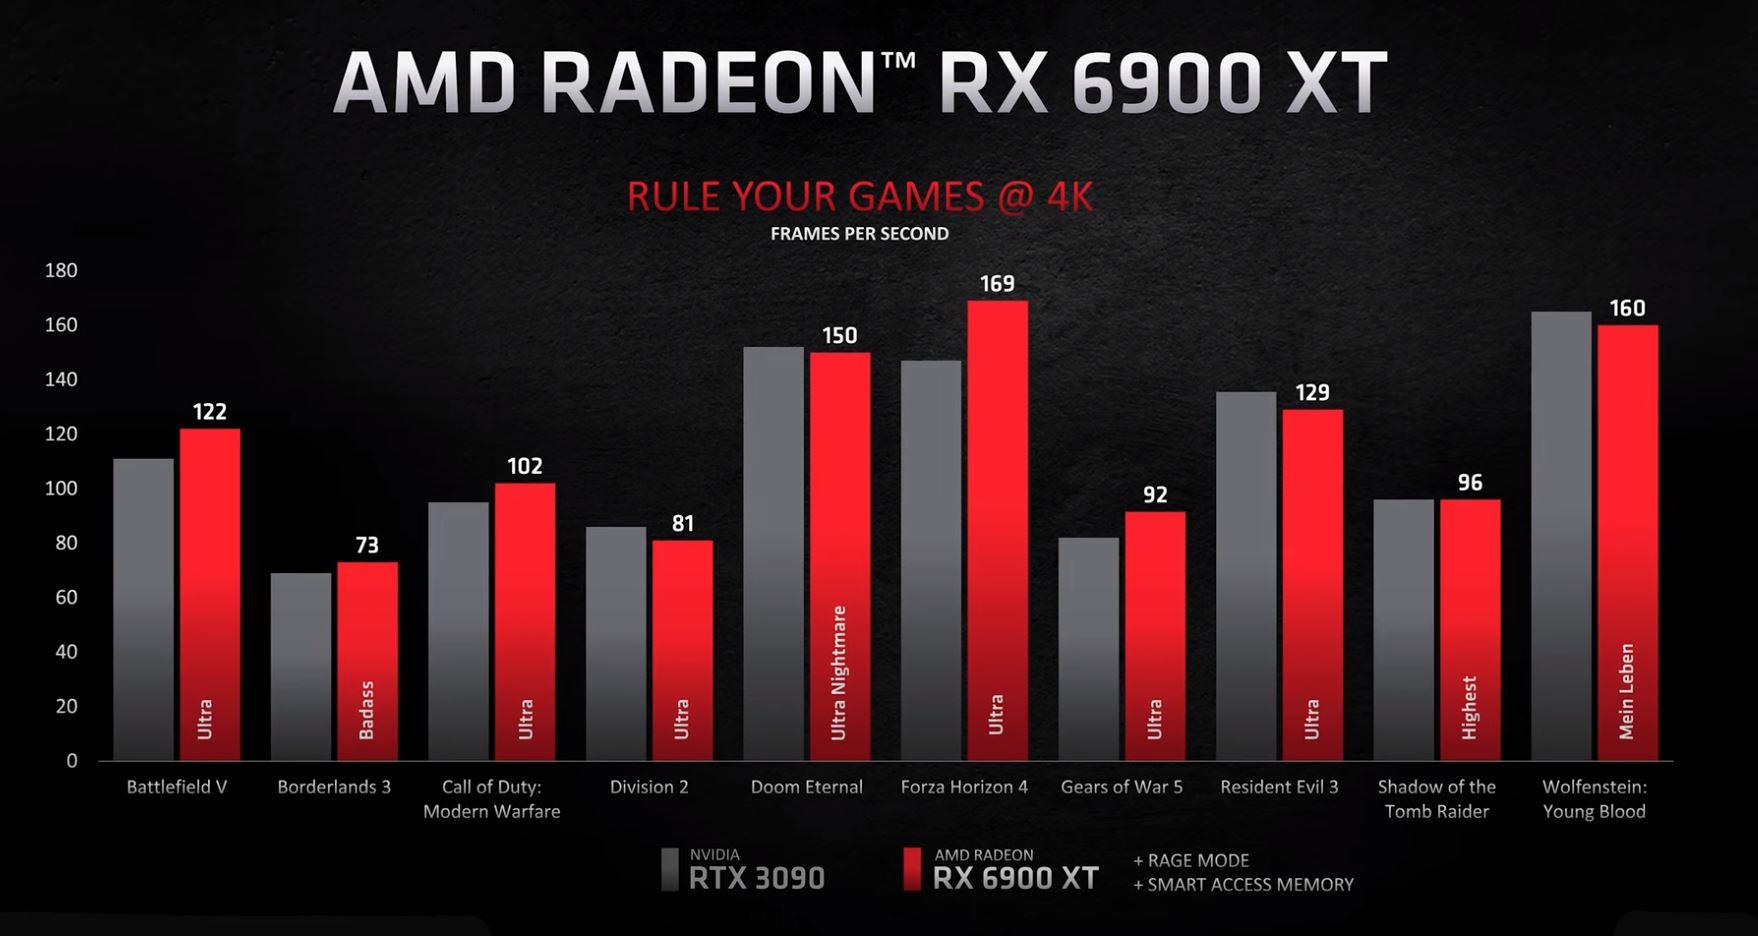 AMD Radeon RX 6900 XT Performance